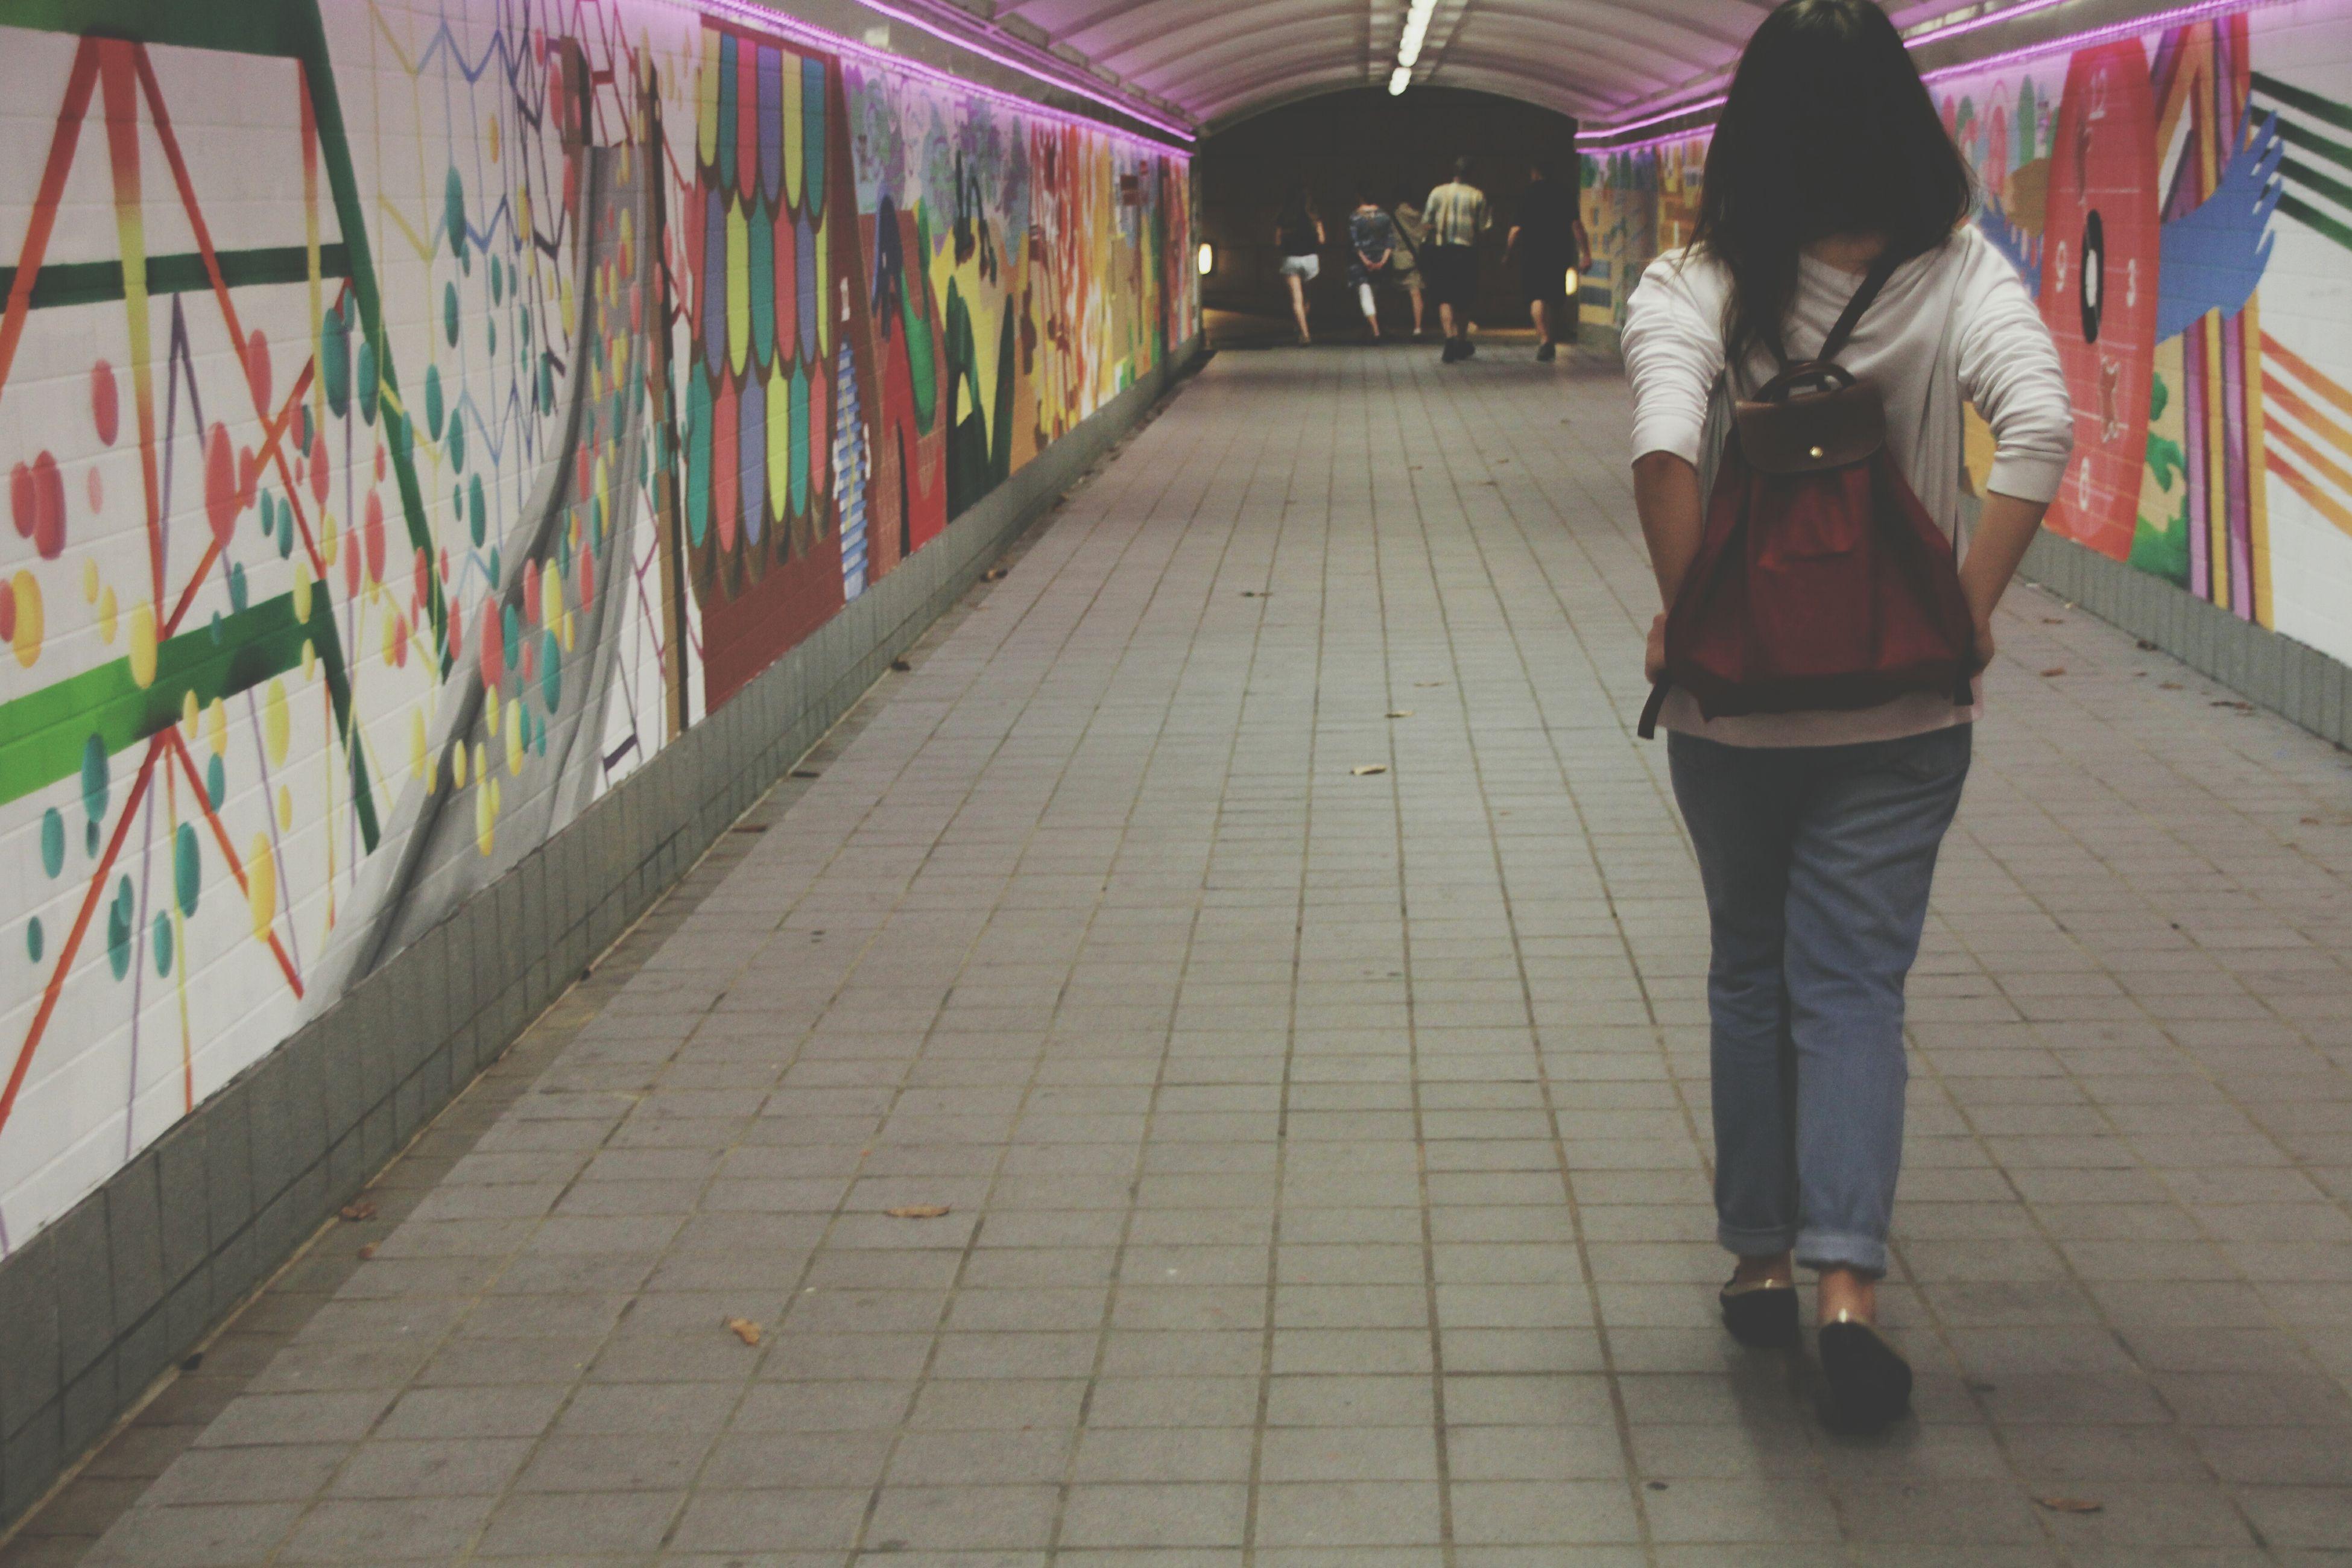 lifestyles, full length, leisure activity, the way forward, flooring, casual clothing, city life, illuminated, corridor, walkway, day, diminishing perspective, tile